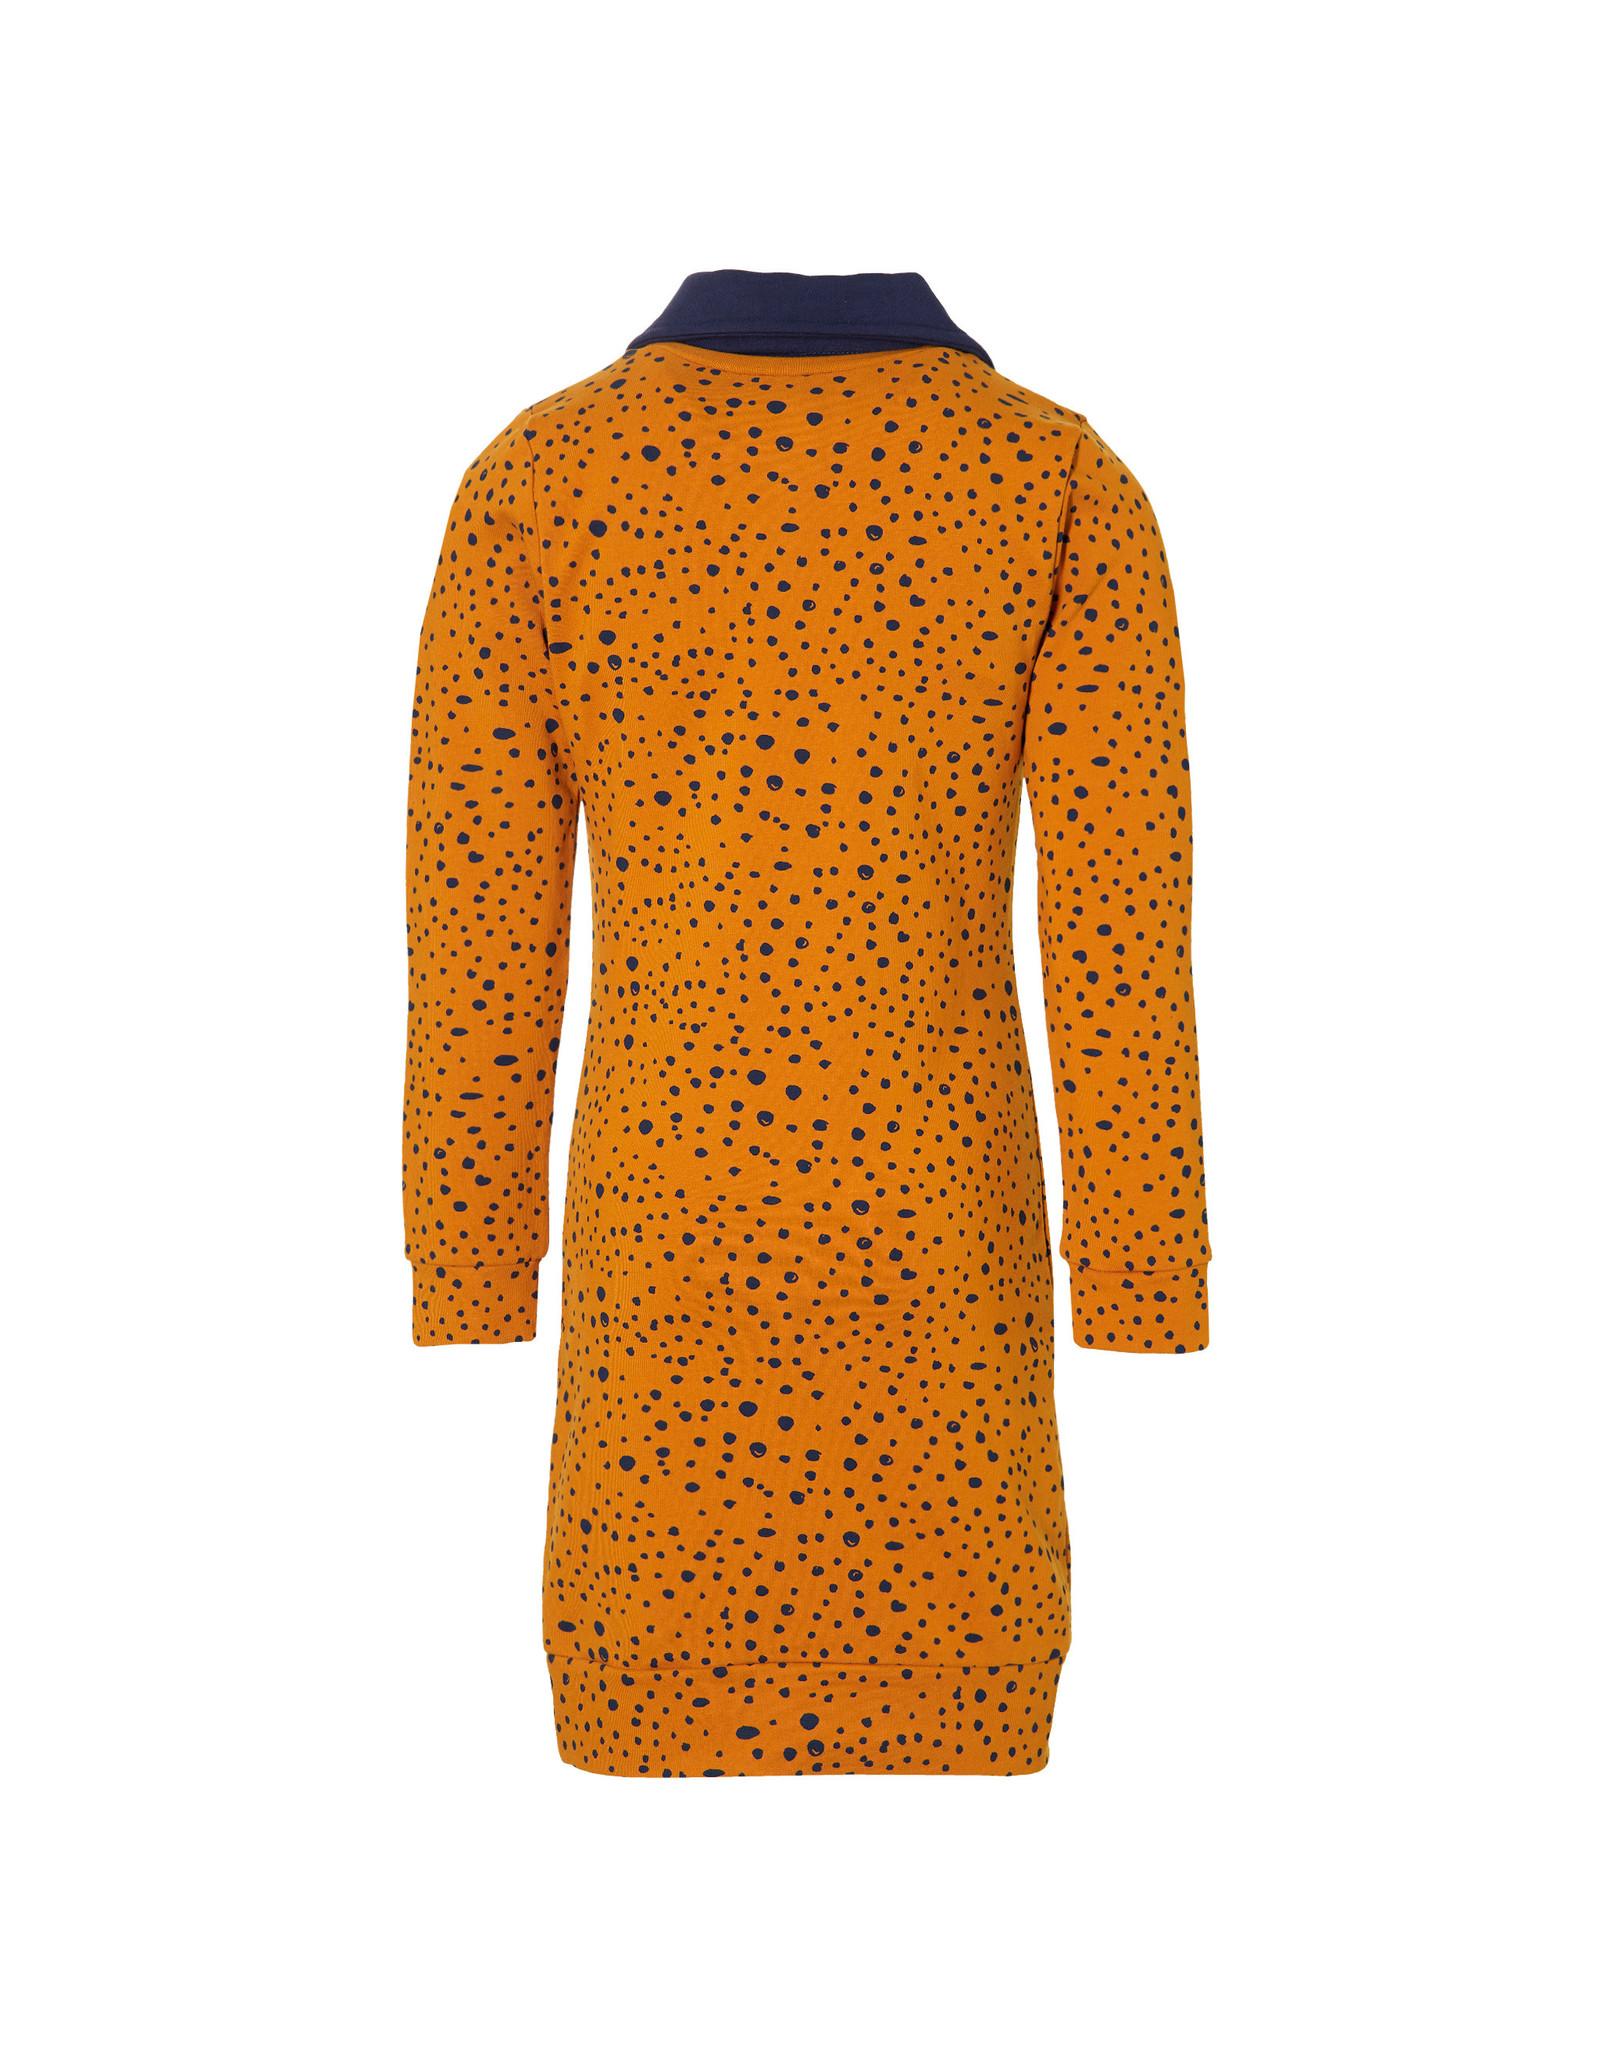 Quapi Quapi meisjes jurk Delice Moster Yellow Dot